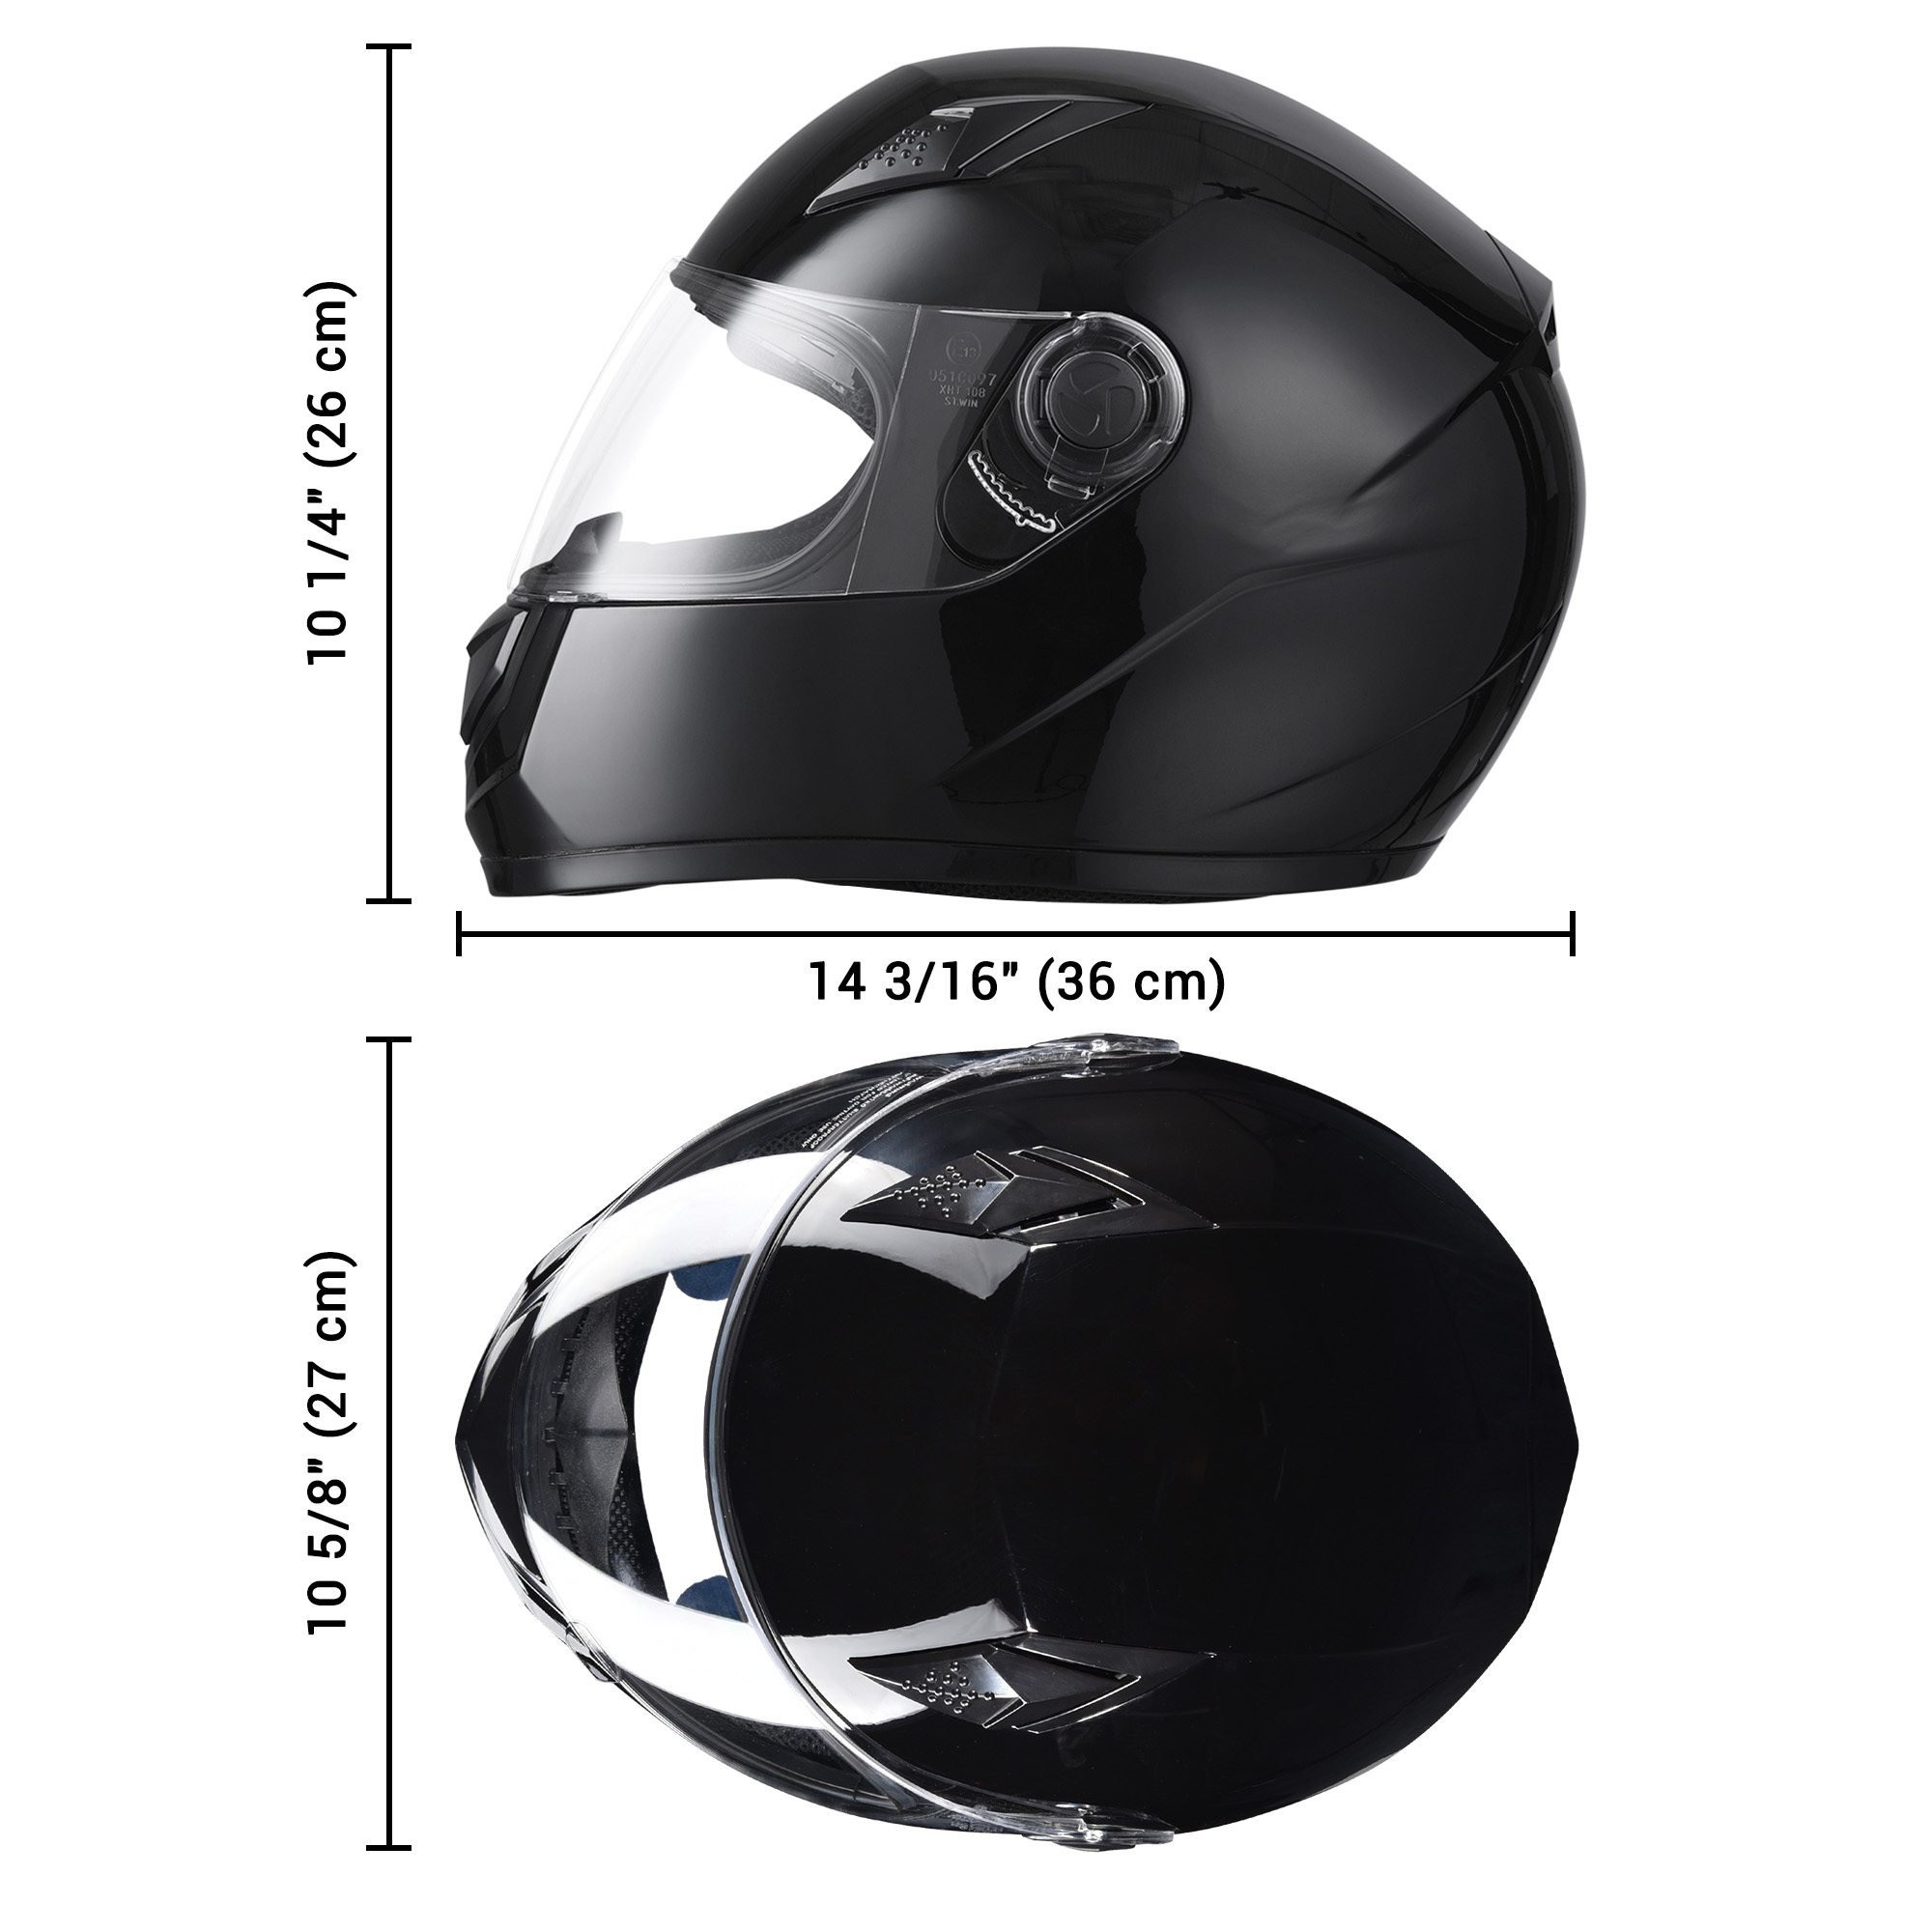 miniature 130 - AHR K12 Full Face Motorcycle Helmet DOT Air Vents Clear Visor Racing S M L XL